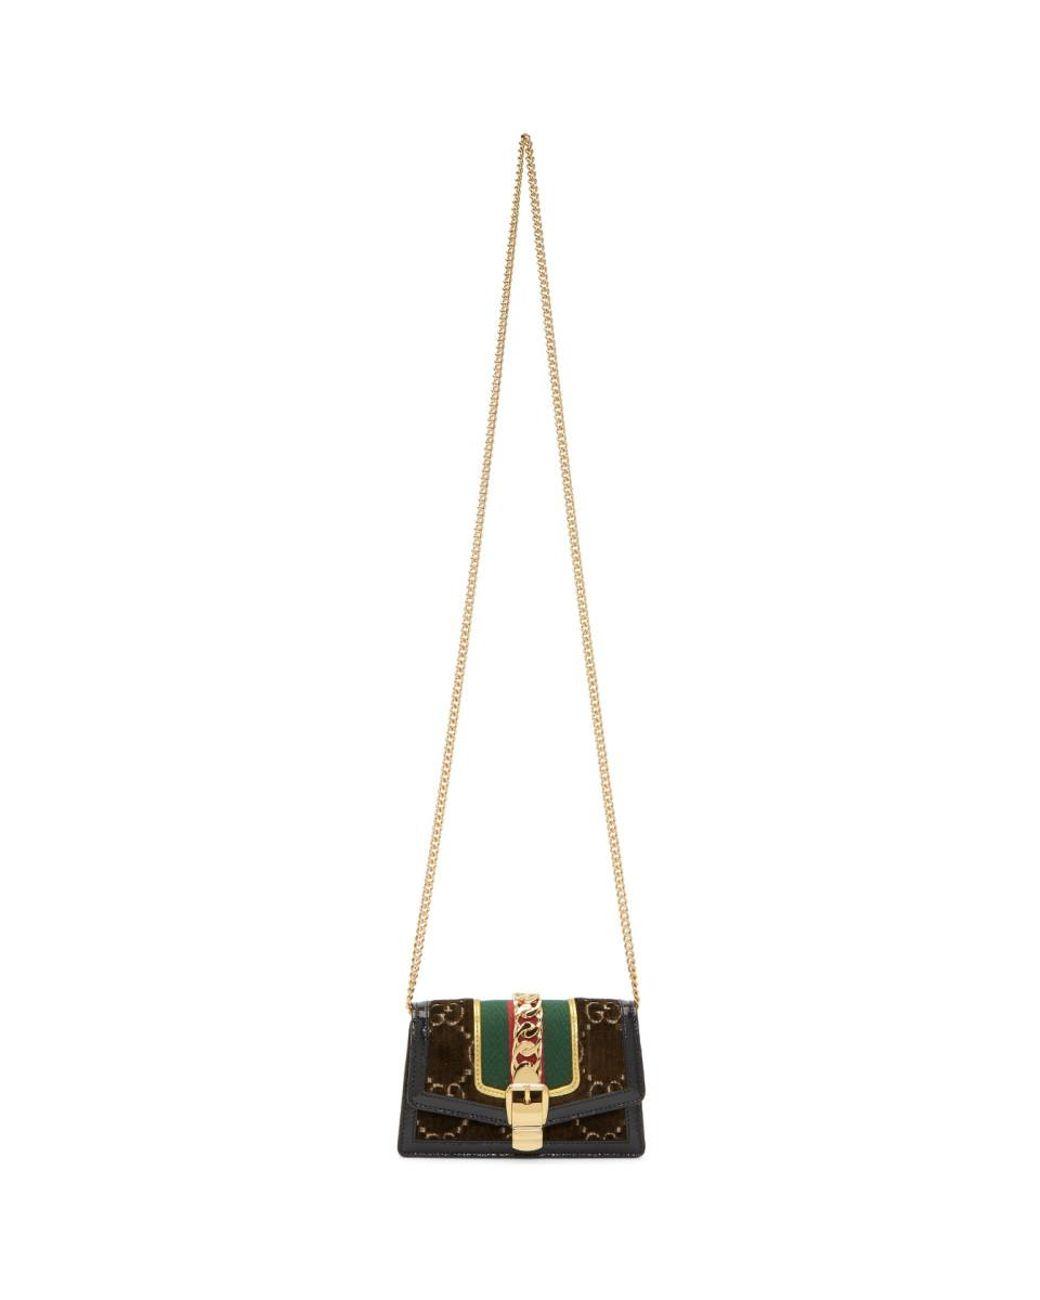 46d5e8c67 Gucci Brown Super Mini Velvet GG Sylvie Chain Bag in Brown - Lyst